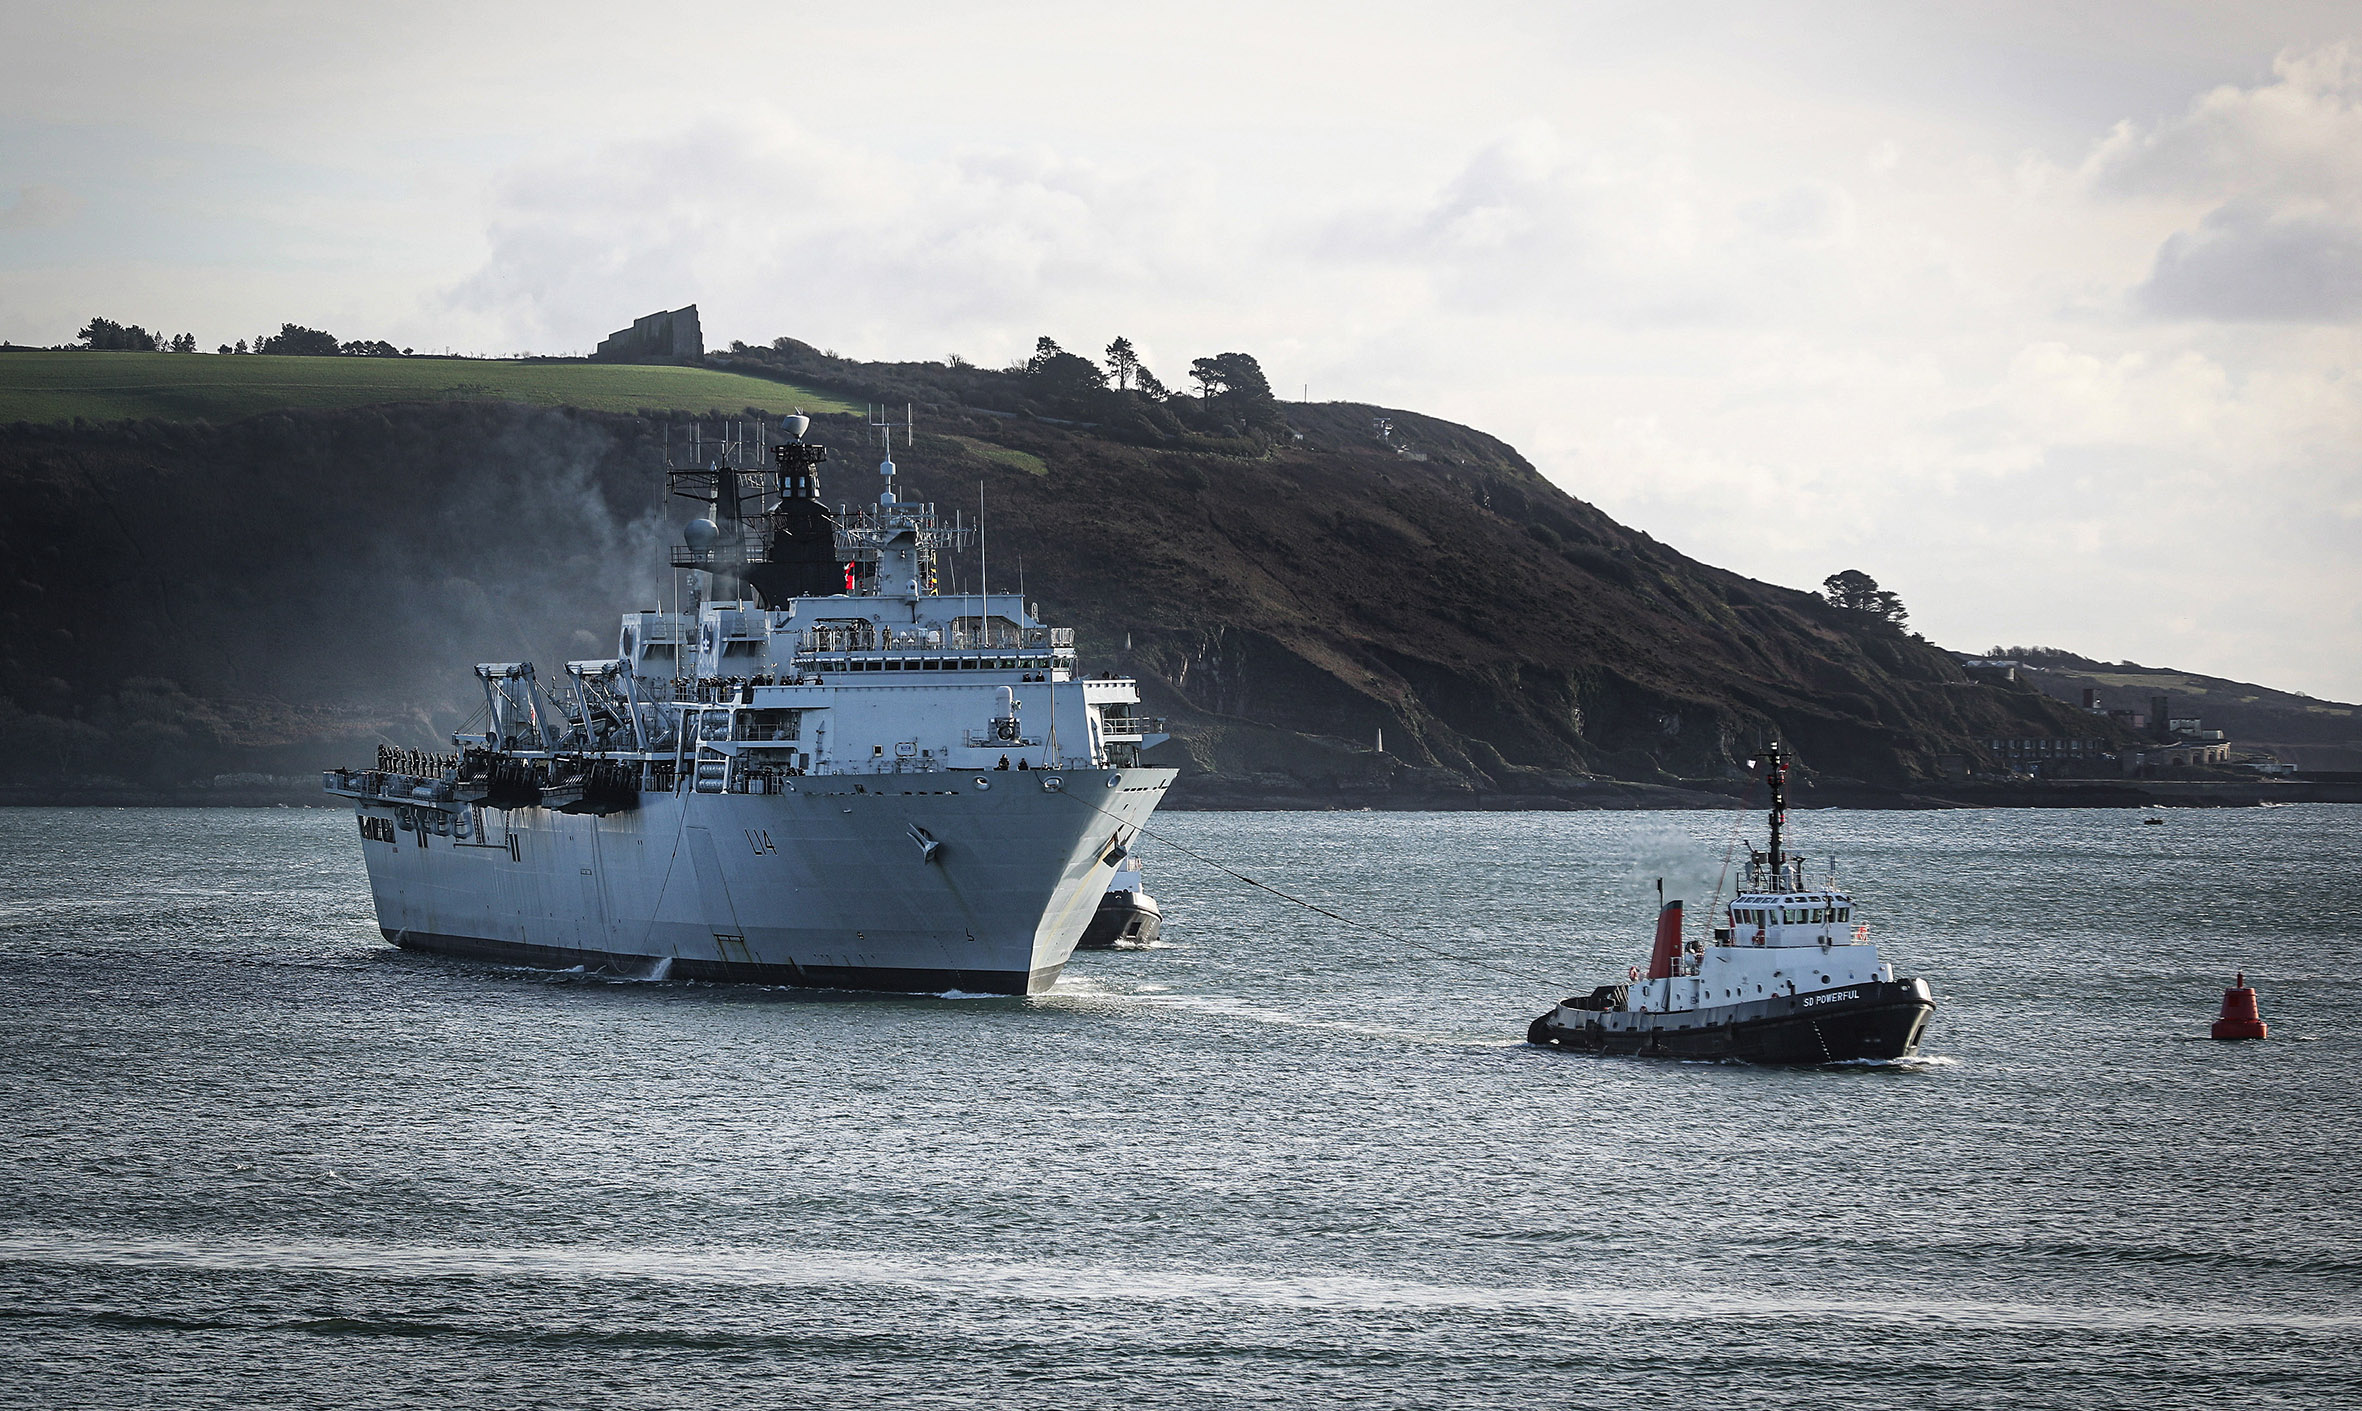 Royal Navy HMS Albion (L14) Returns Home After Experimental Deployment